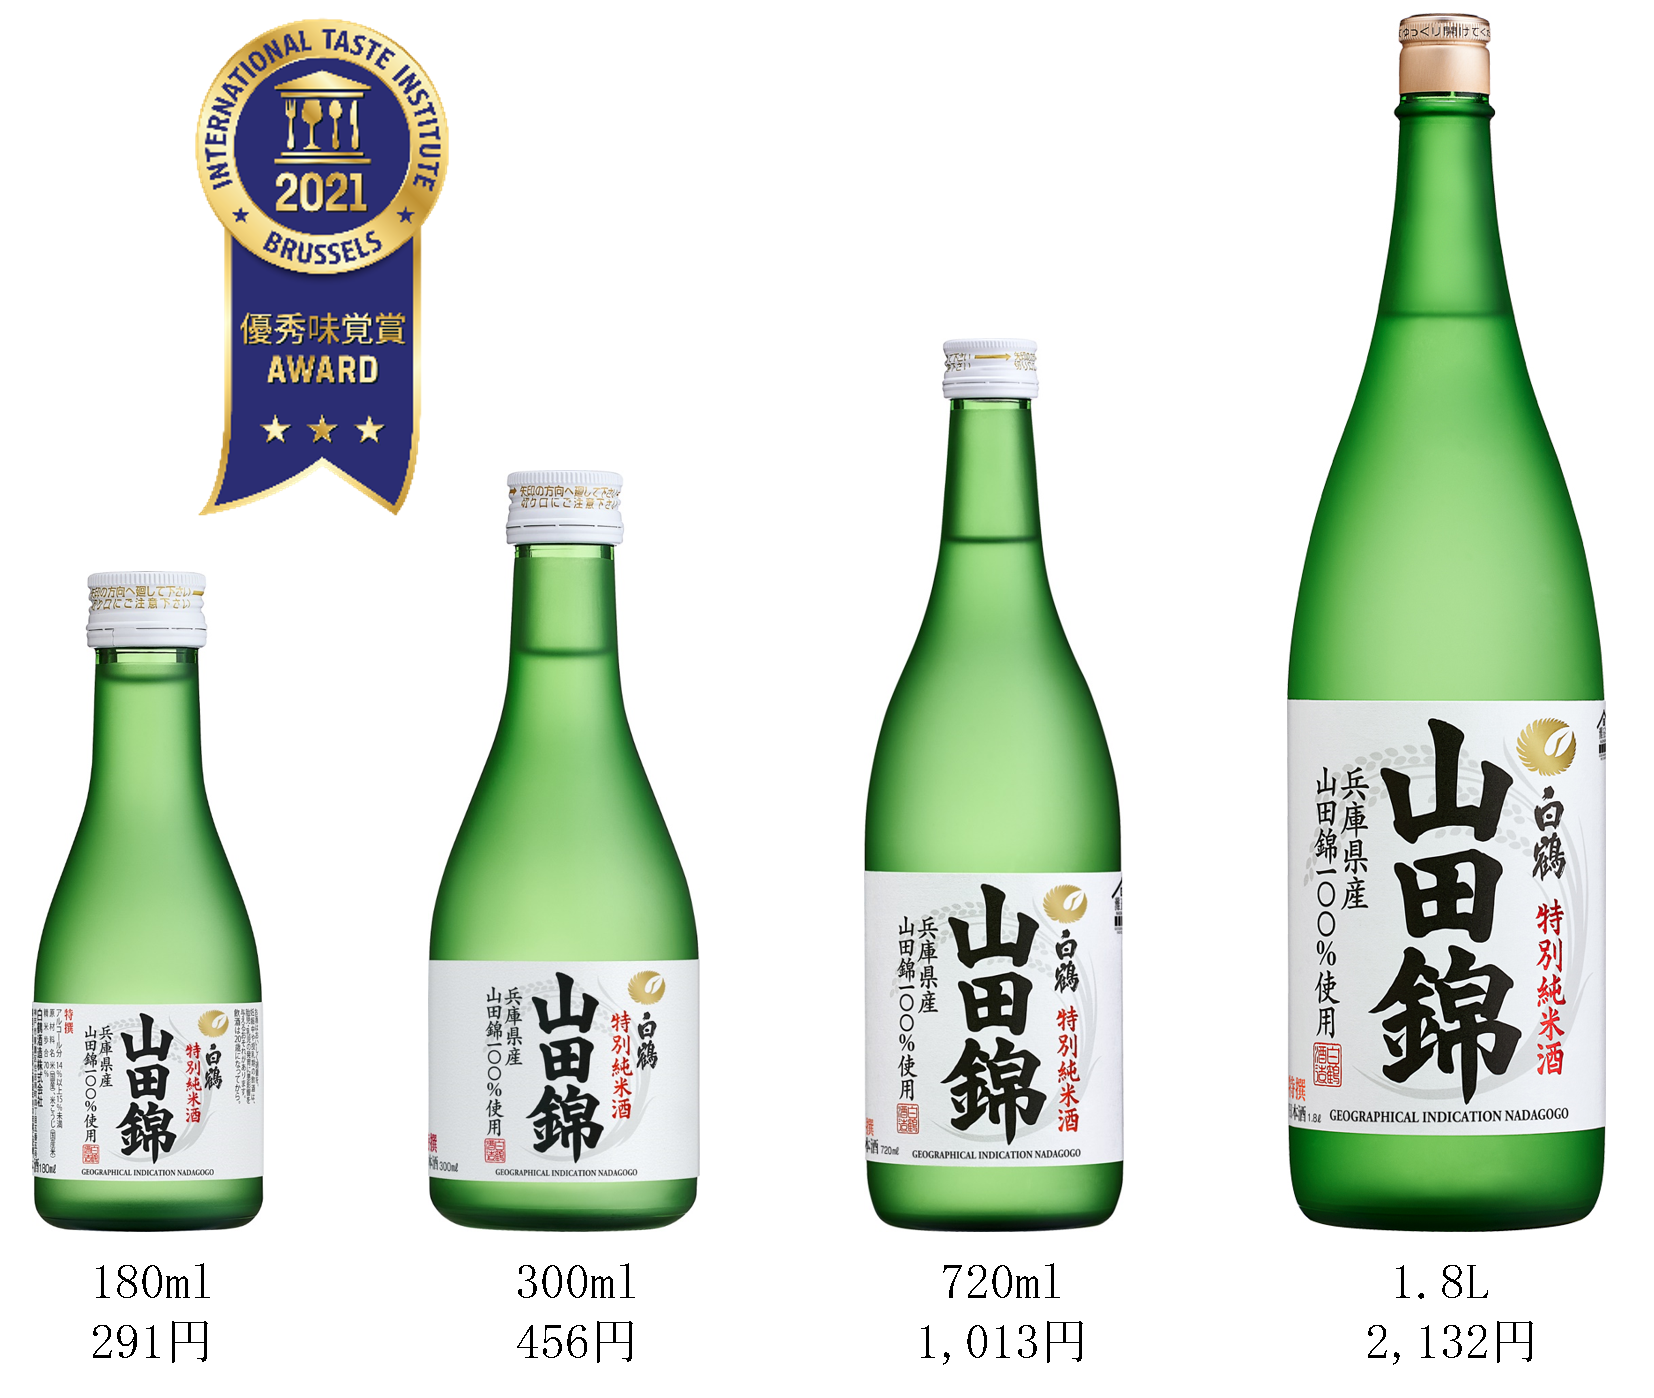 2021年International Taste Instituteで「特撰 白鶴 特別純米酒 山田錦」が優秀味覚賞「3ツ星」受賞